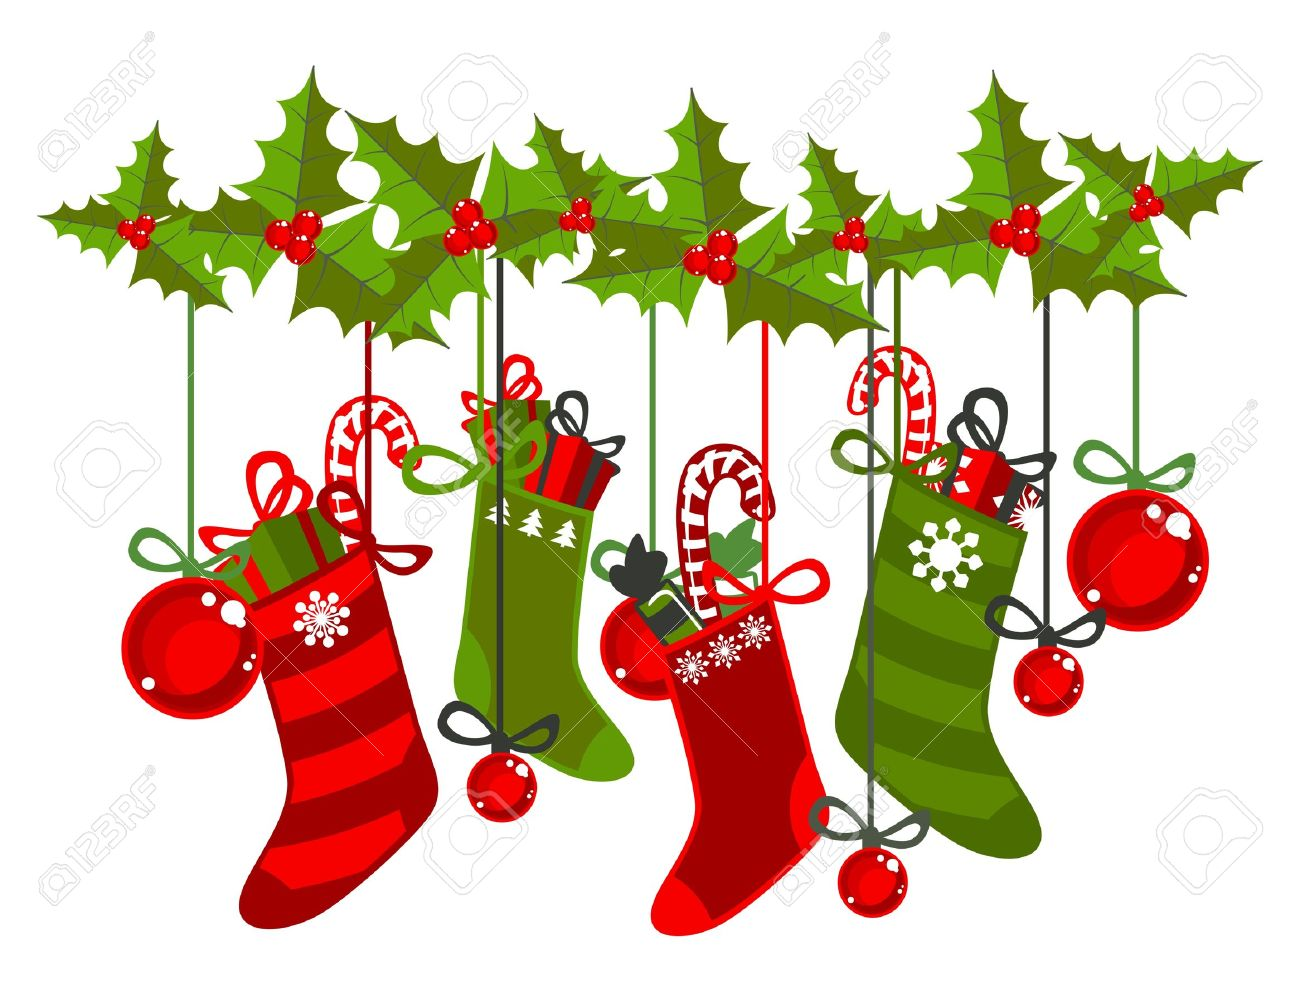 Christmas Stockings Reviews And Rambles